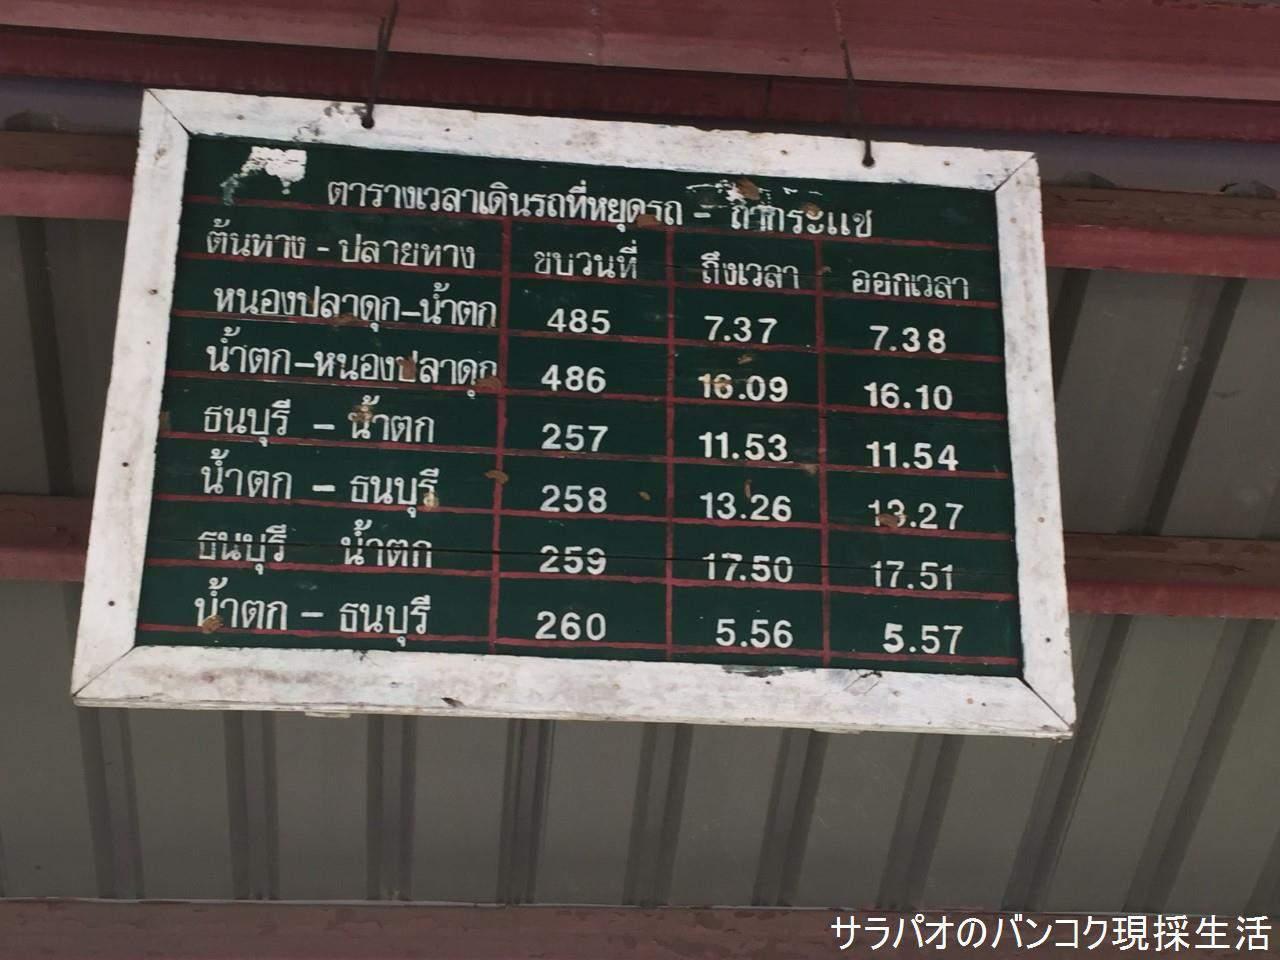 Kanchanaburi_3_09.jpg